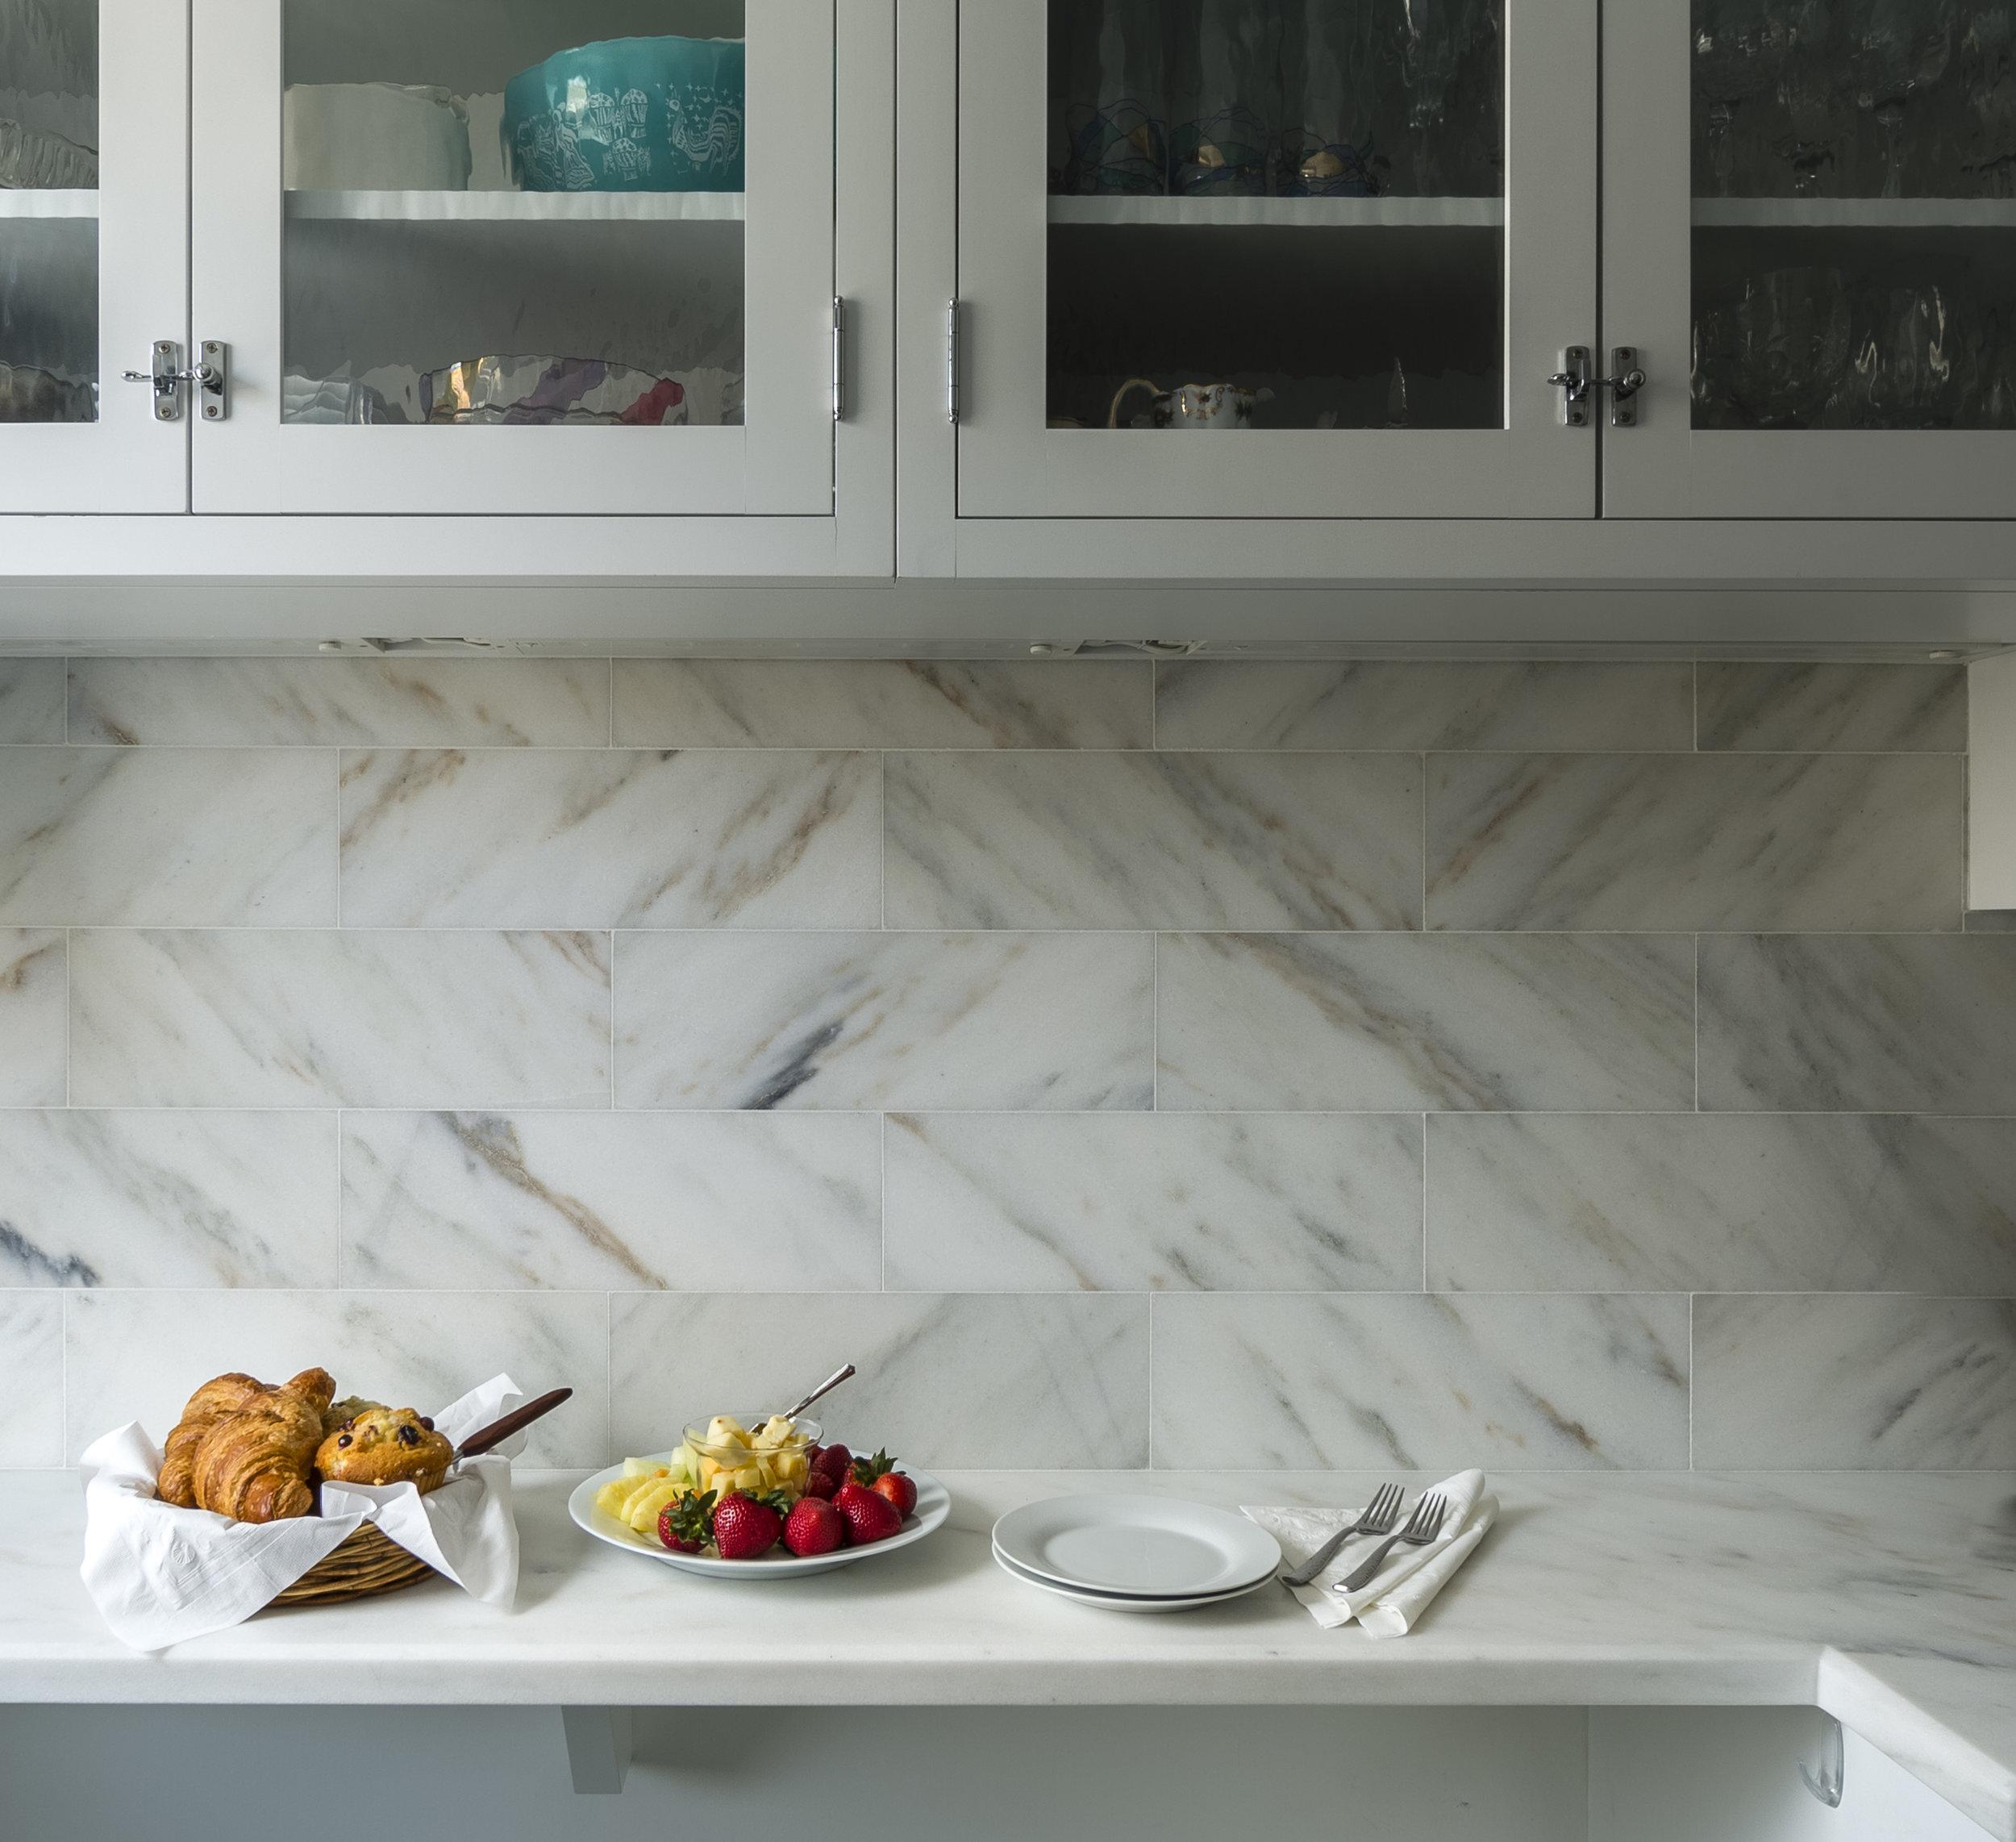 Litwak Residence_Kitchen_Danby_May Green-4.jpg